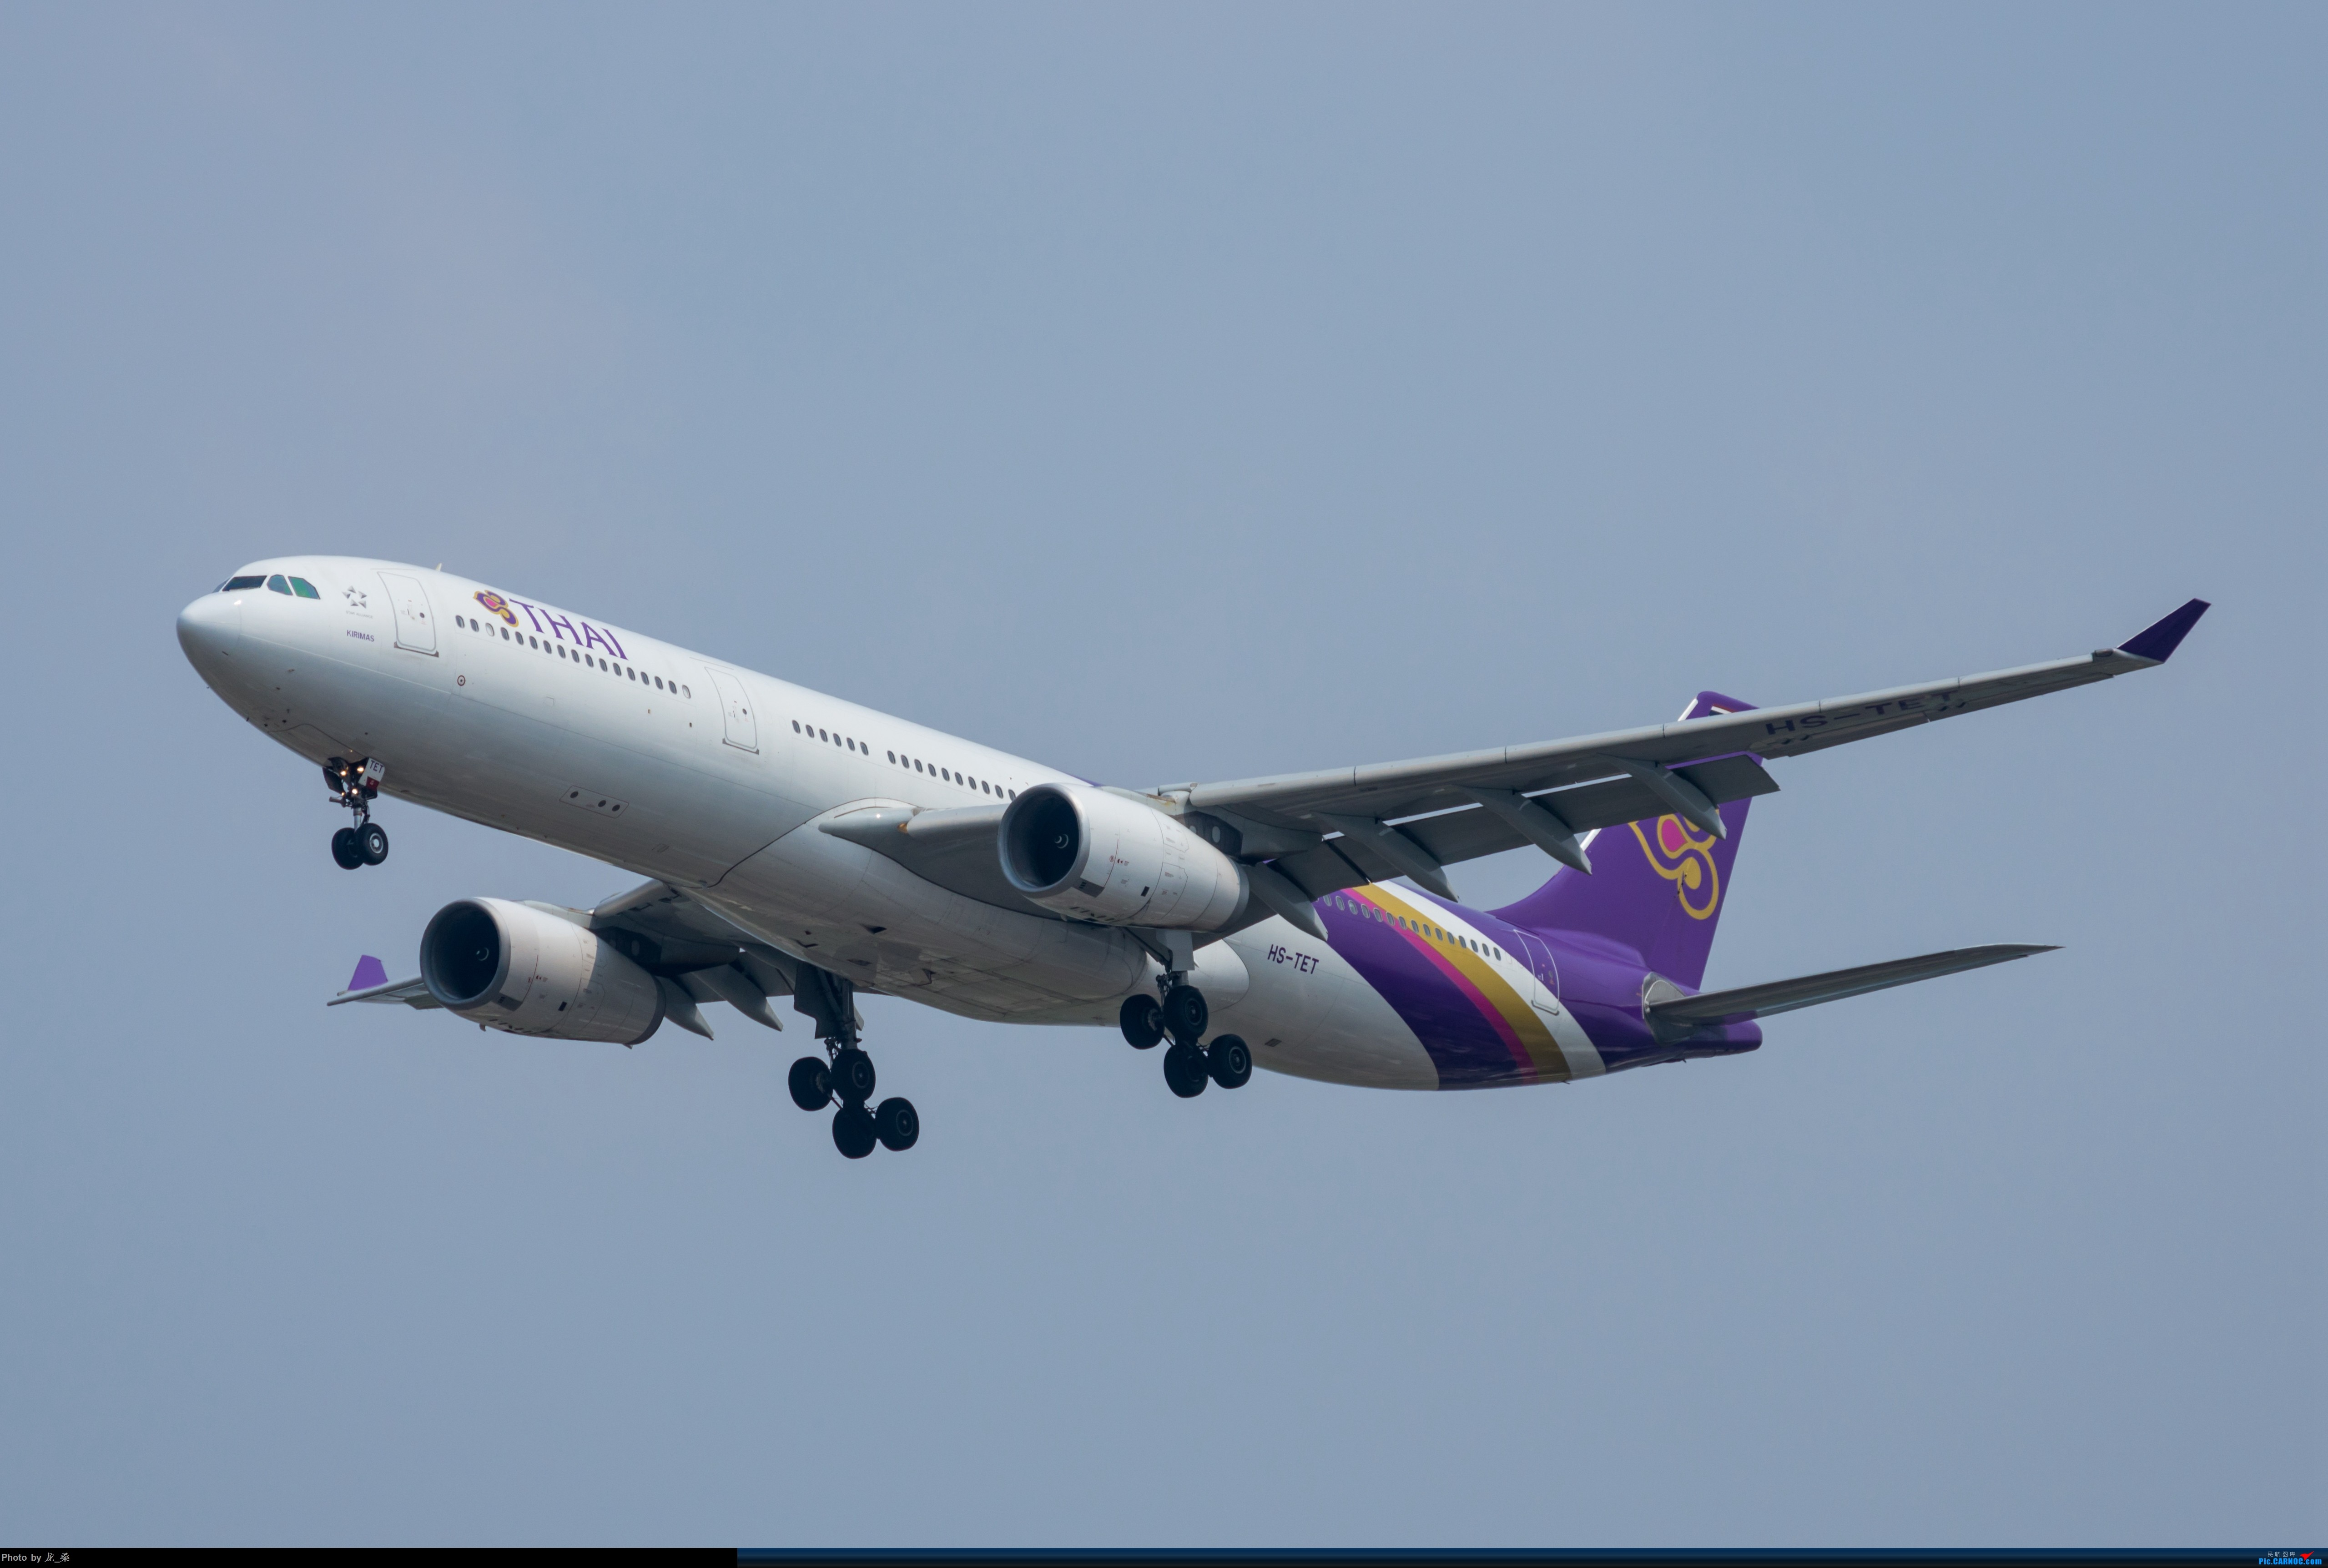 Re:[原创]发一组老图,去年拍的CAN东跑道进近 AIRBUS A330-300 HS-TET 中国广州白云国际机场